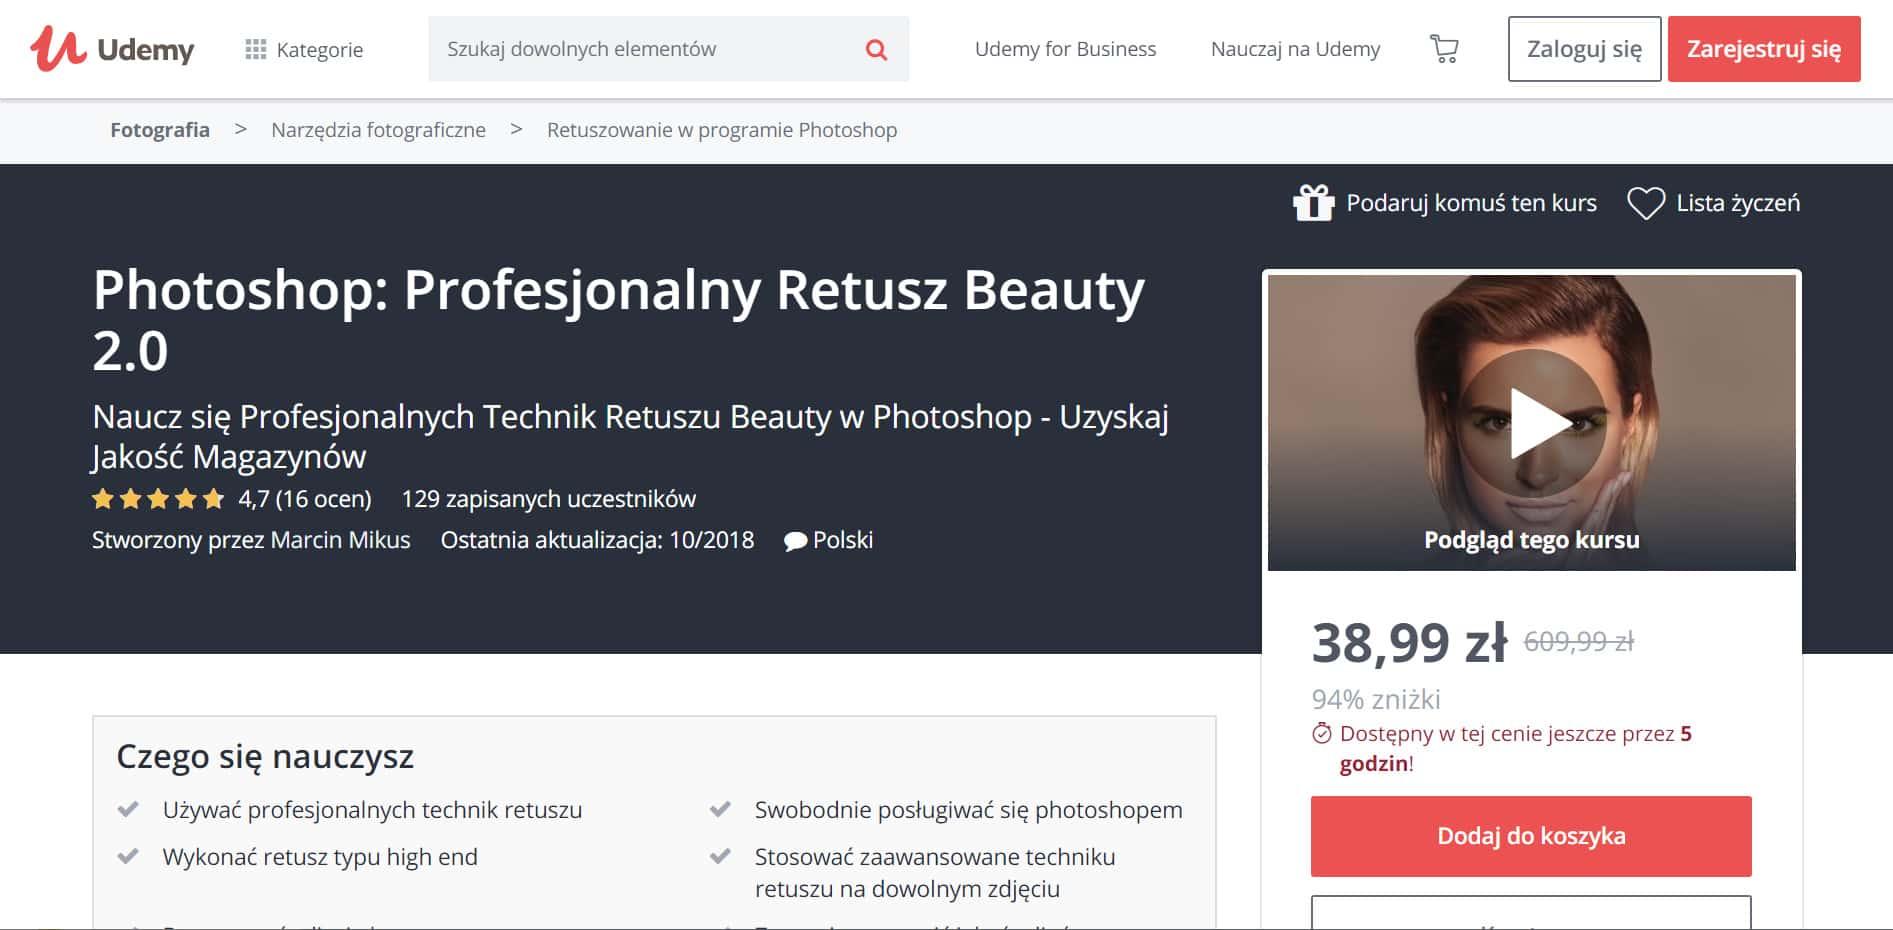 Udemy - Photoshop profesjonalny retusz beauty